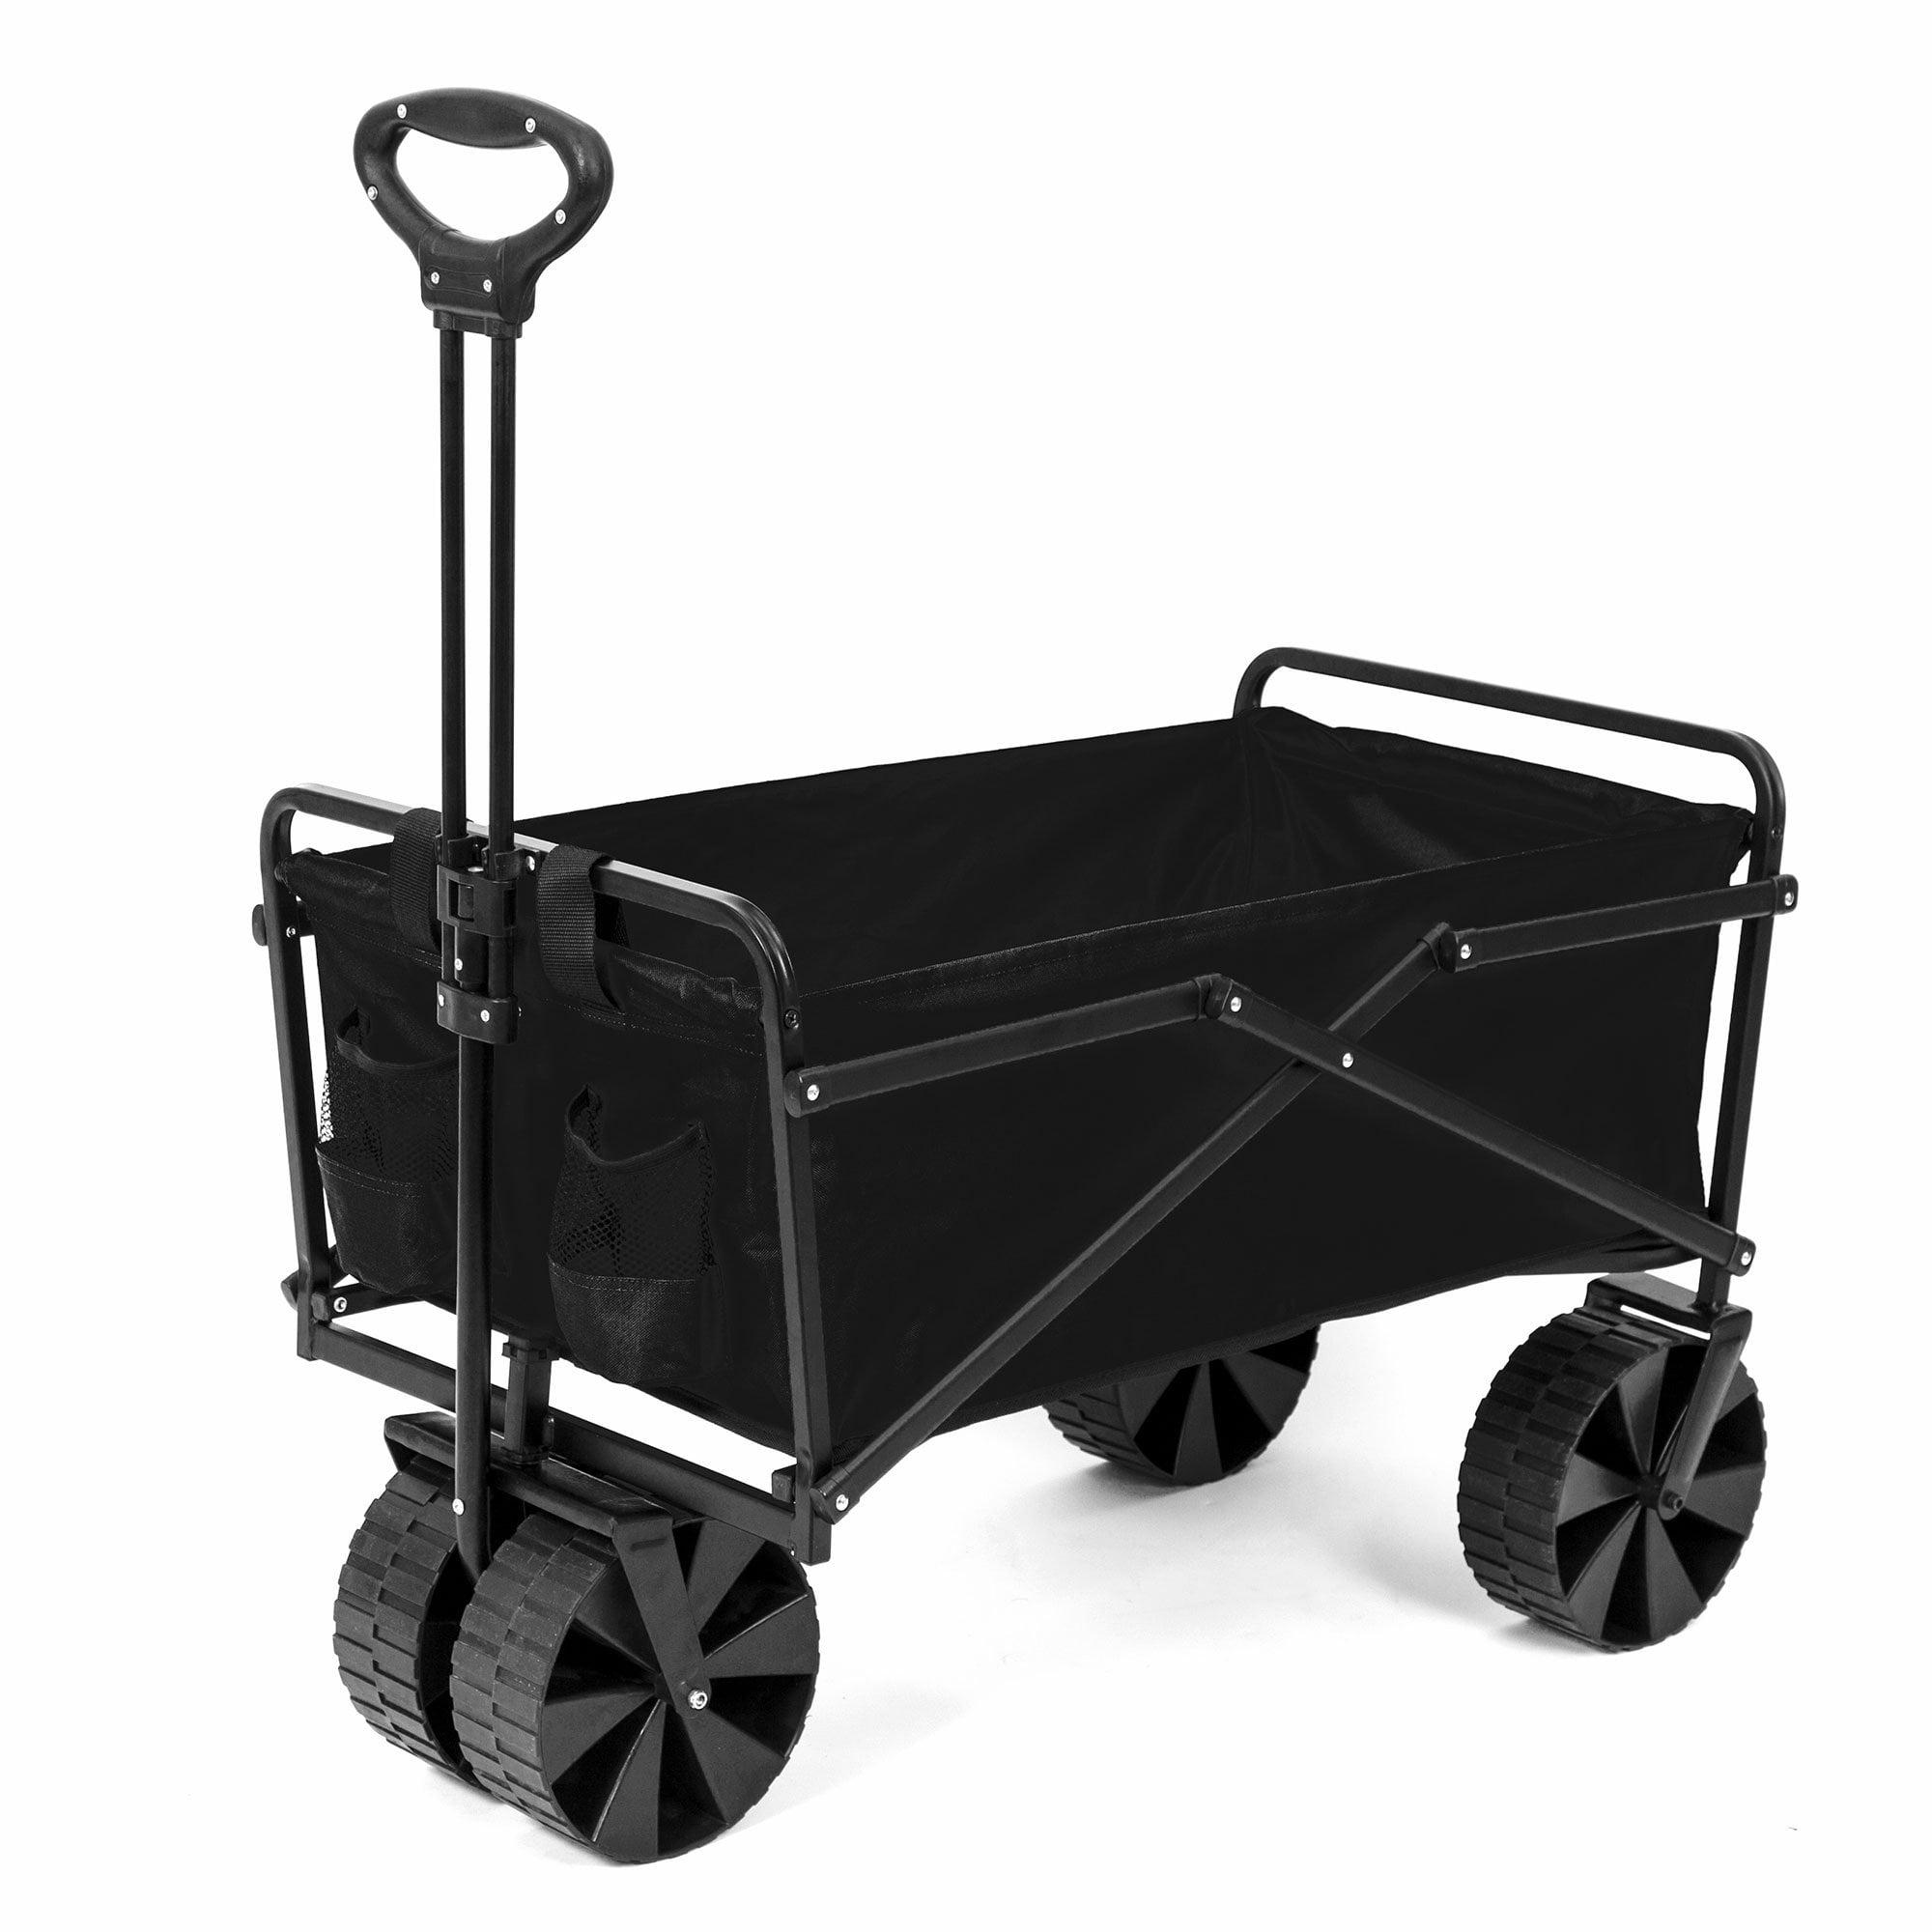 Seina Collapsible Utility Wagon and Garden Cart , Black